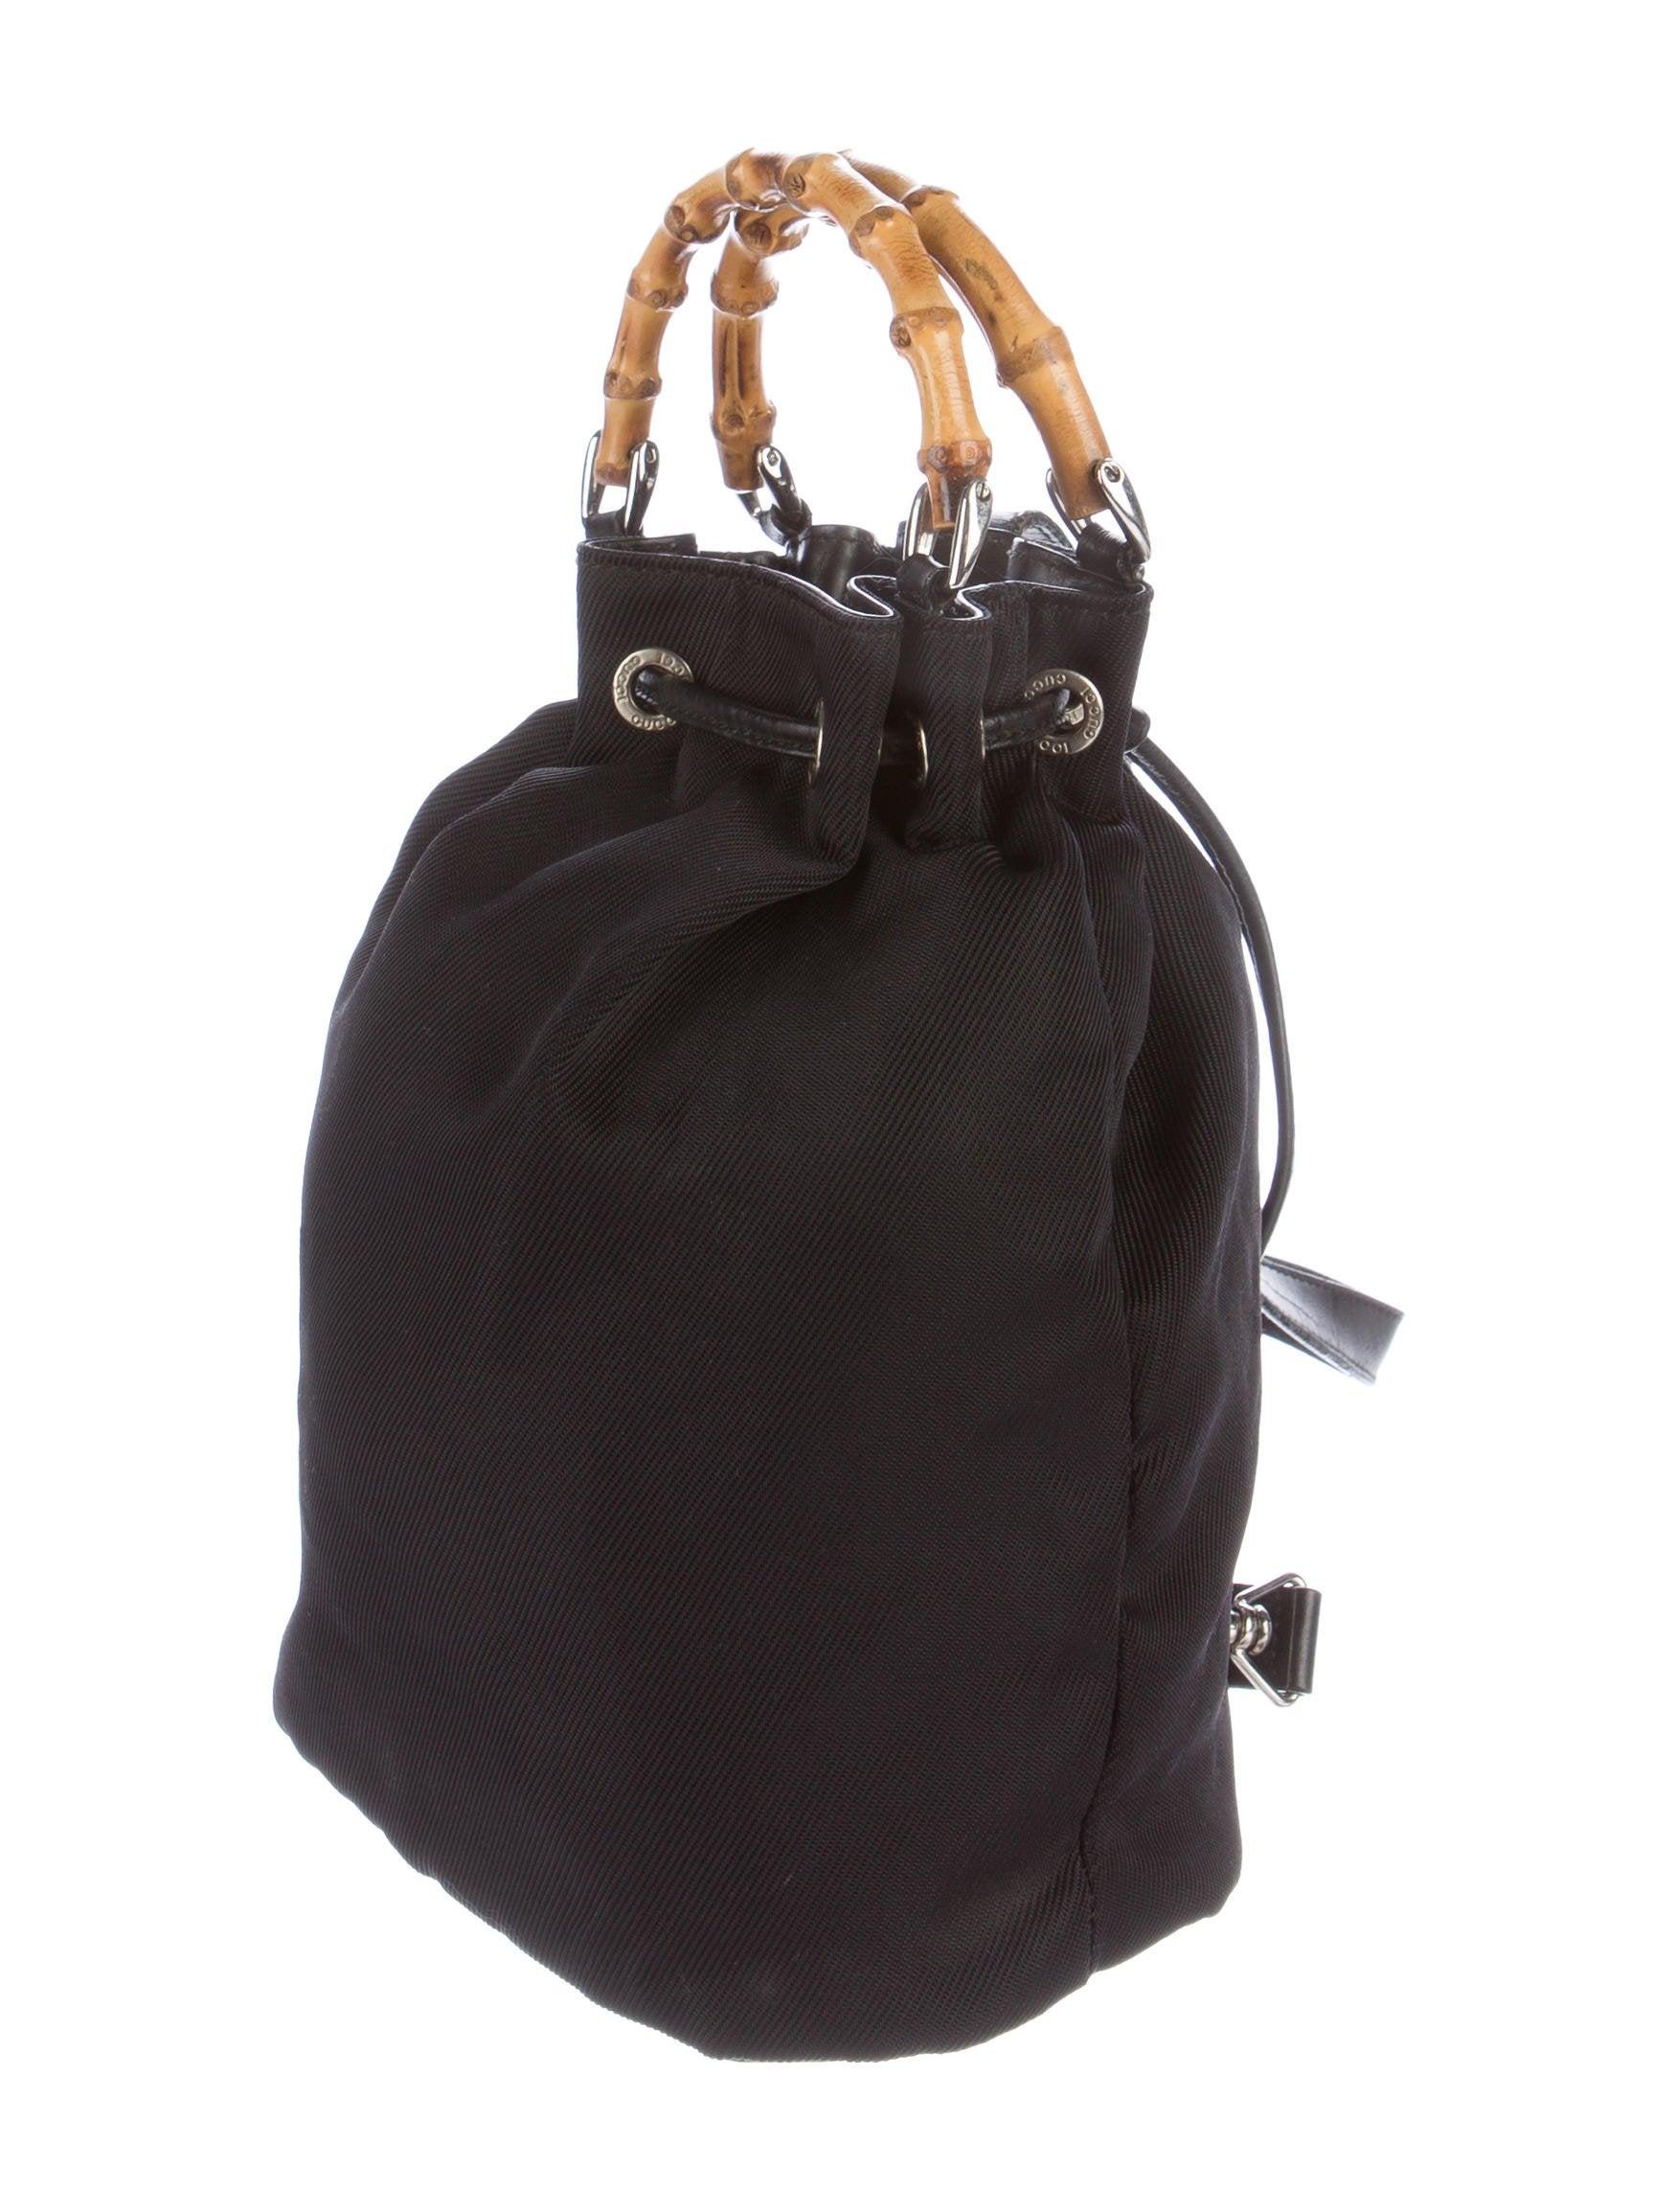 Innovative Gallery For U0026gt; Gucci Sling Bag Men